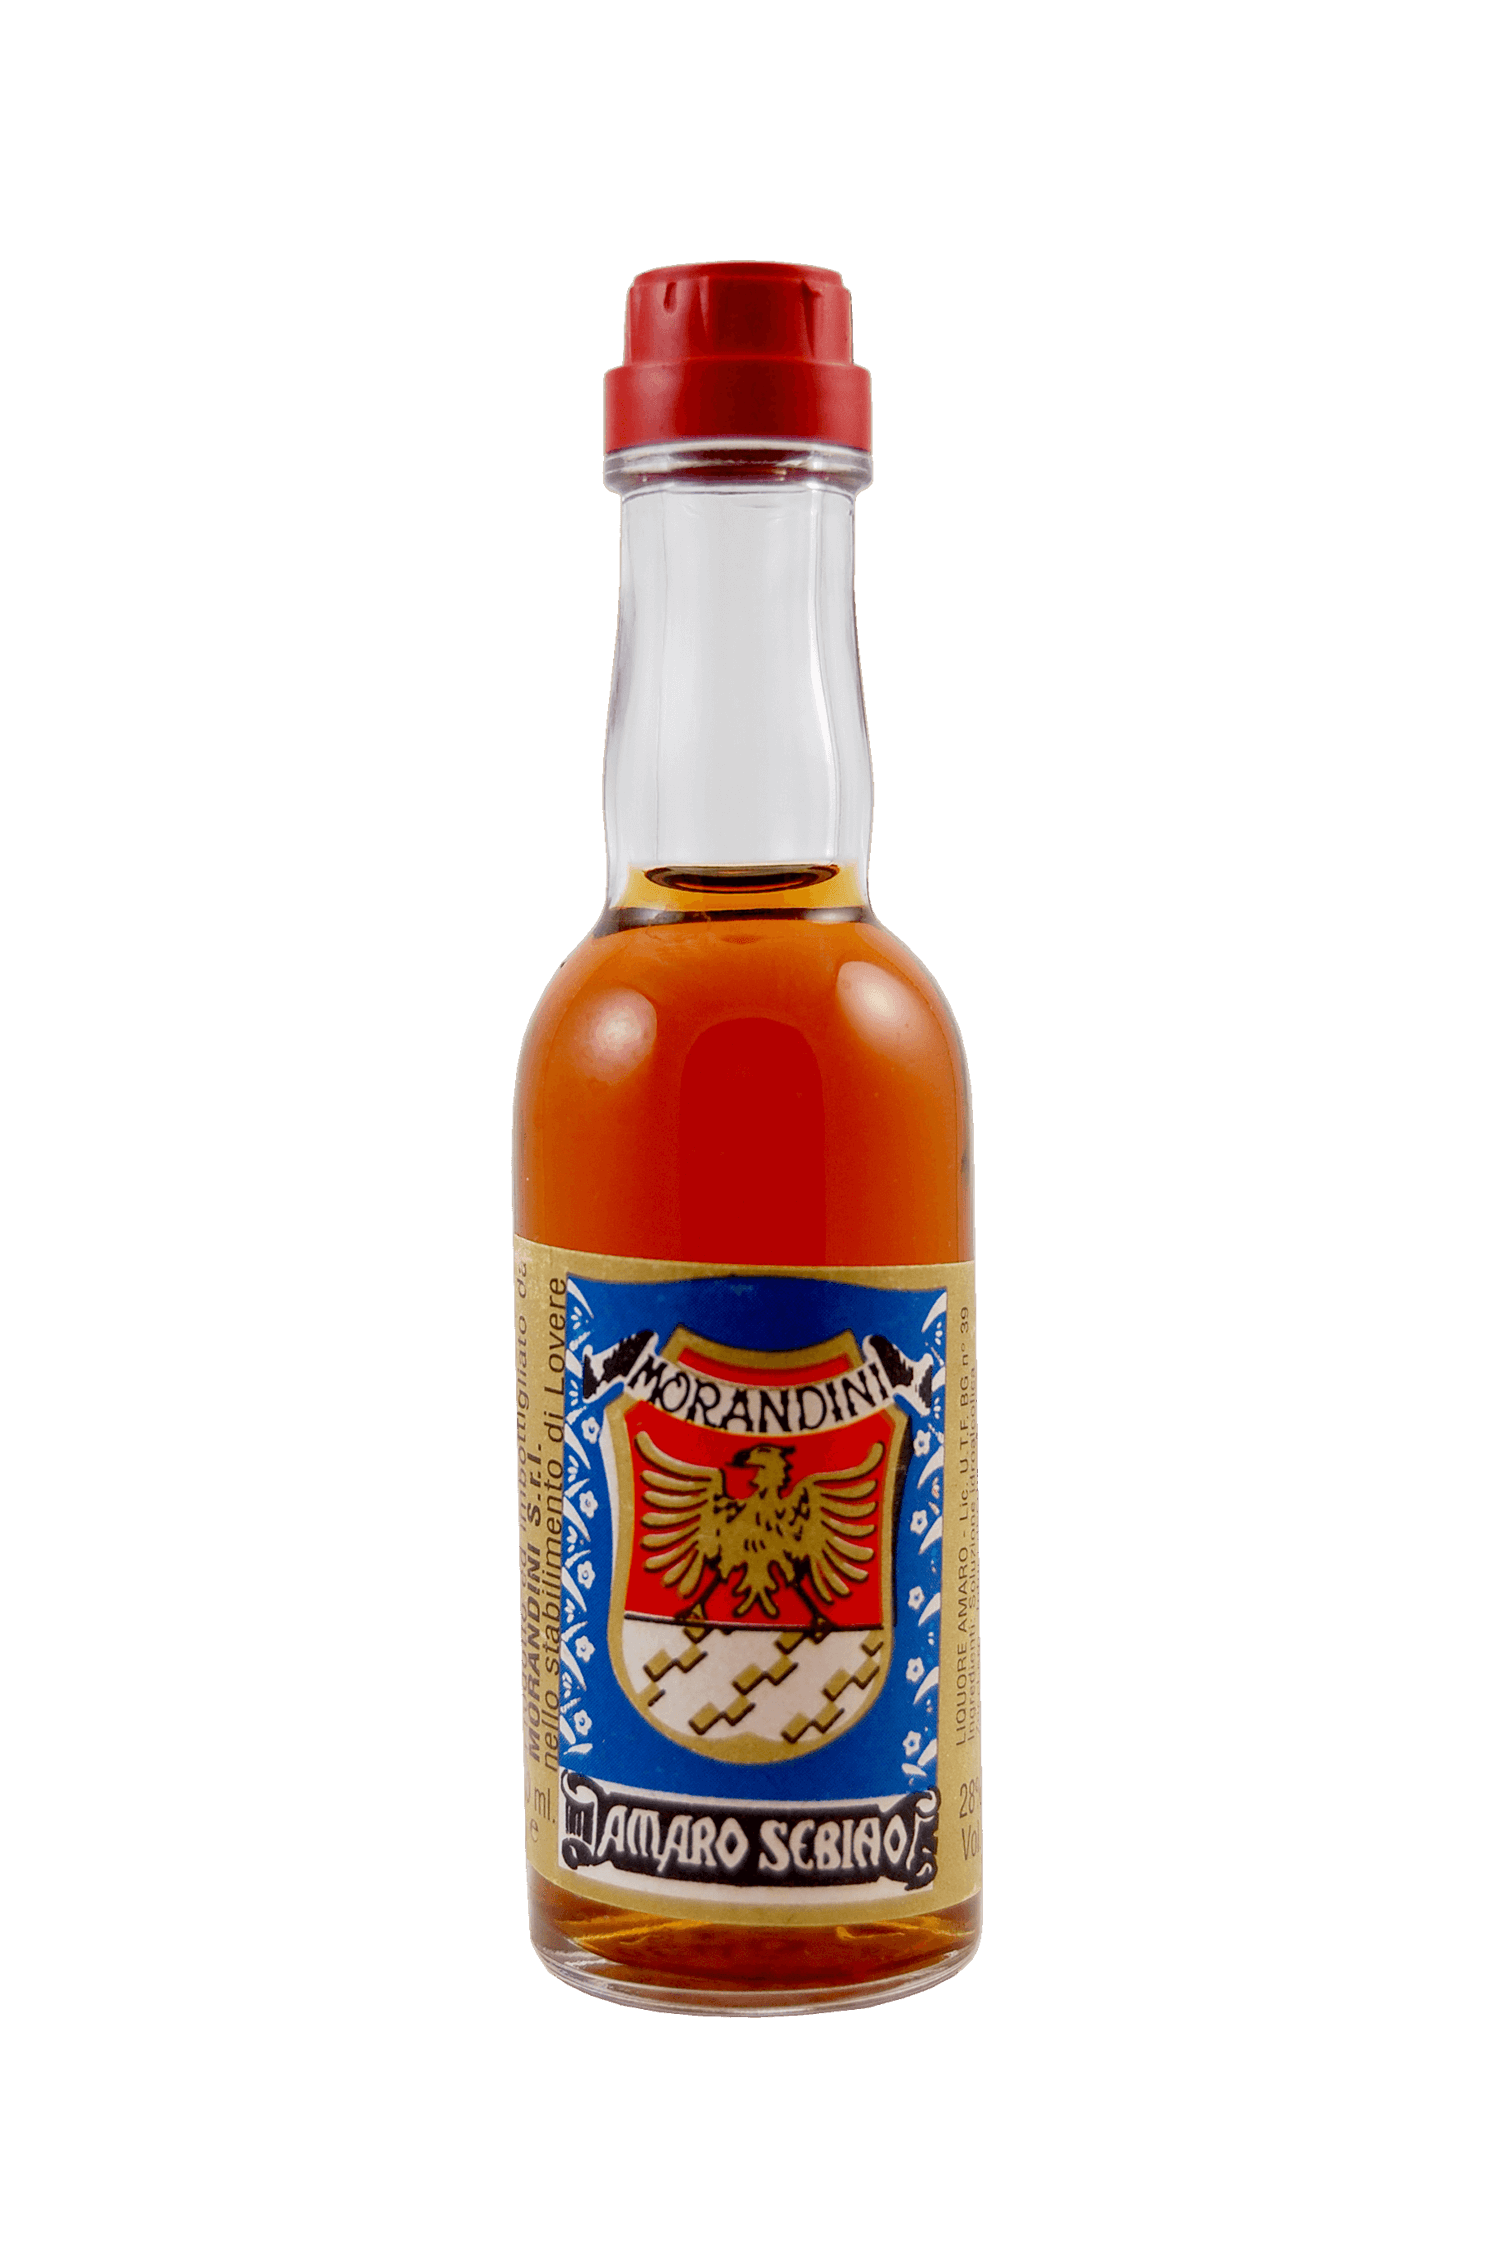 Morandini Amaro Sebiao